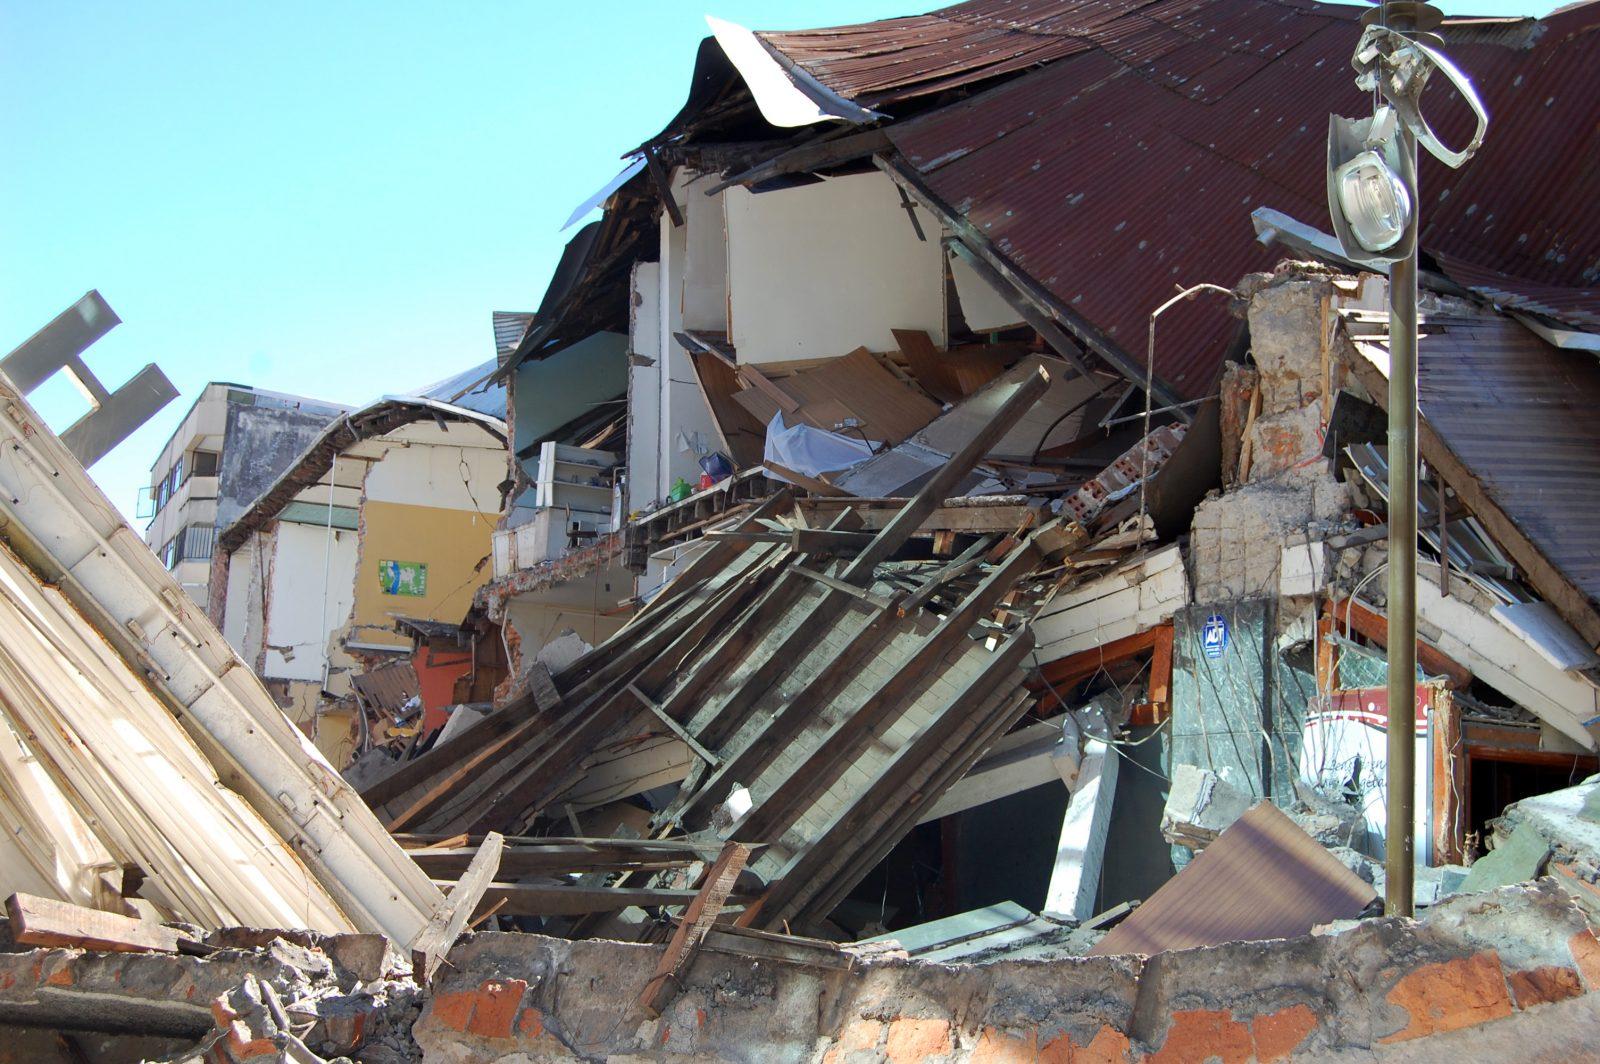 Magnitude-8.8 earthquake hit Chile in April 2010. Stock photo courtesy of Yai.